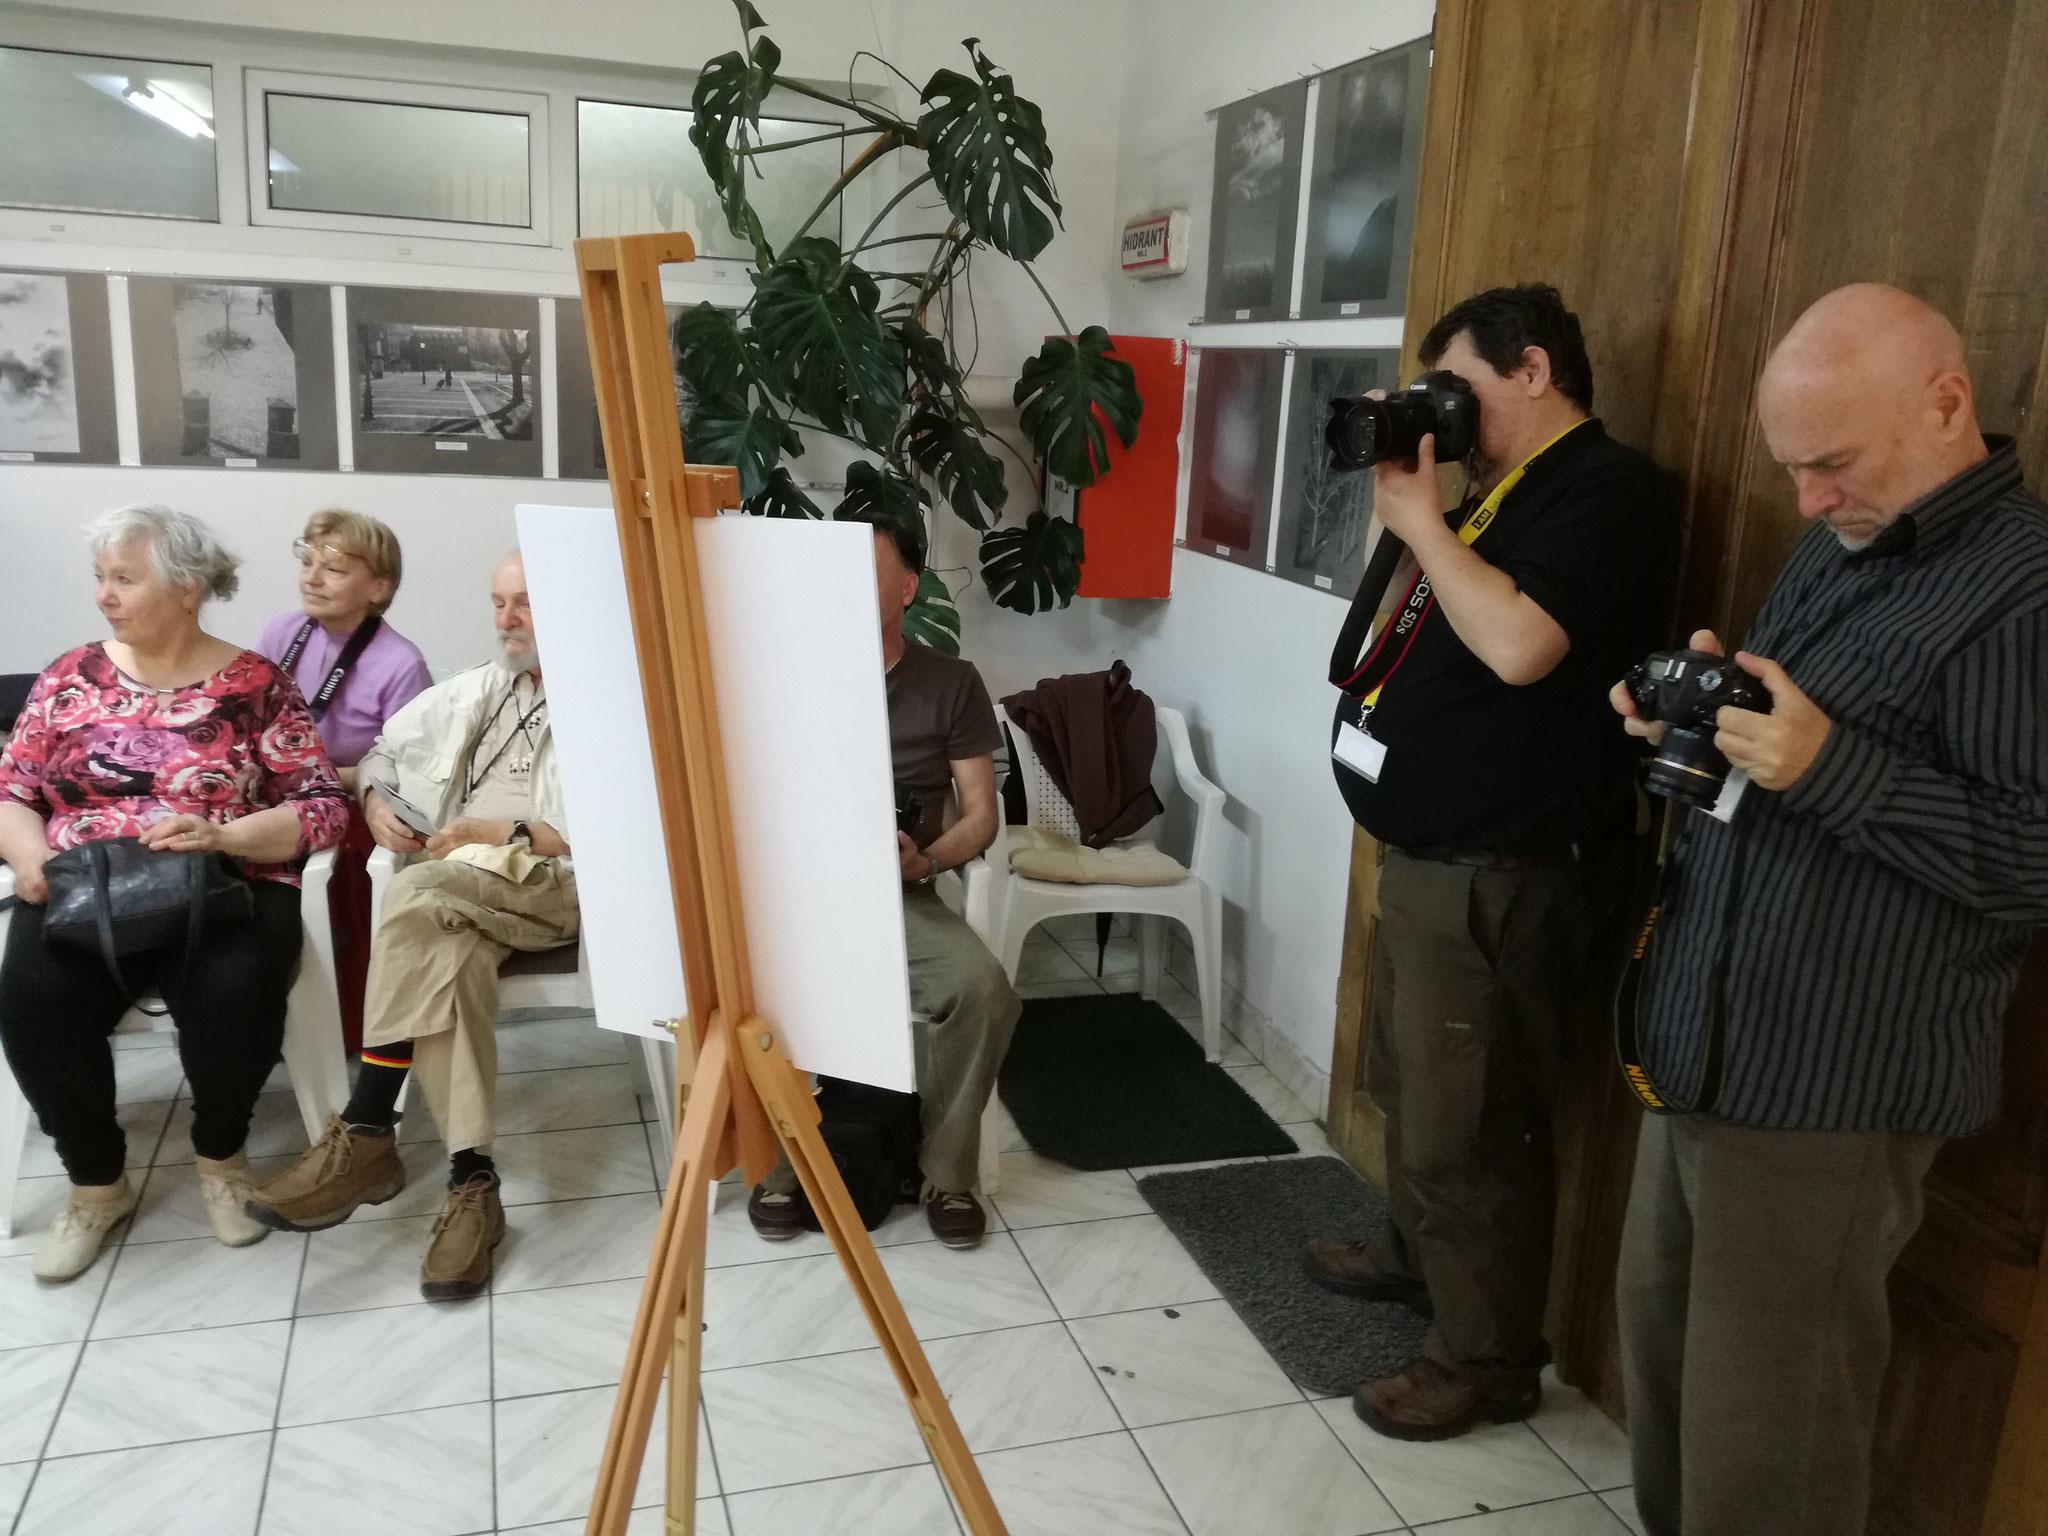 The opening of Virág István's EFIAP, Sombor (SRB ) personal exhibit